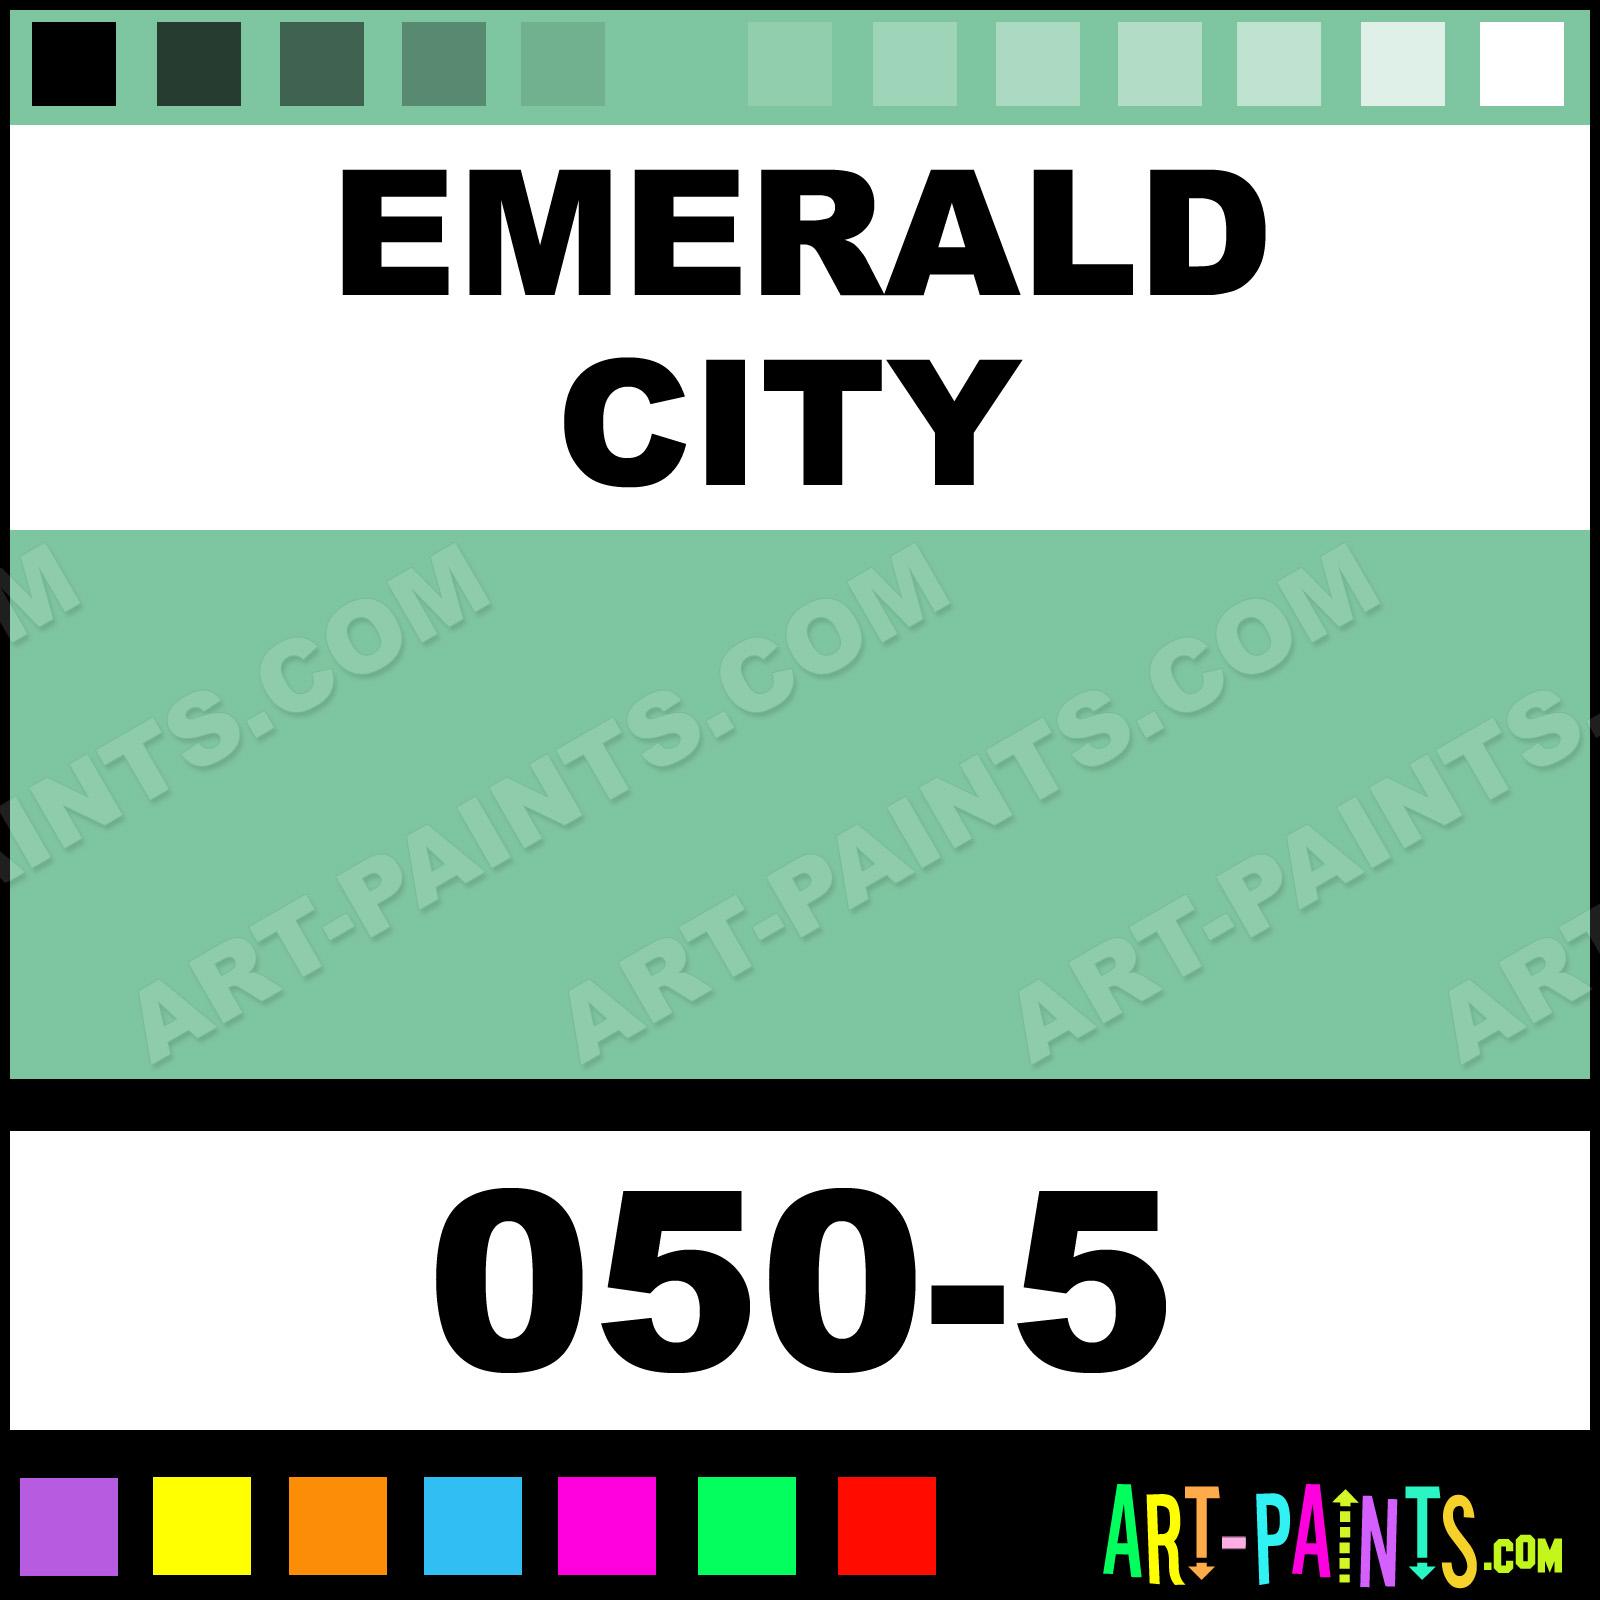 Emerald city ultra ceramic ceramic porcelain paints 050 for Emerald city nickname